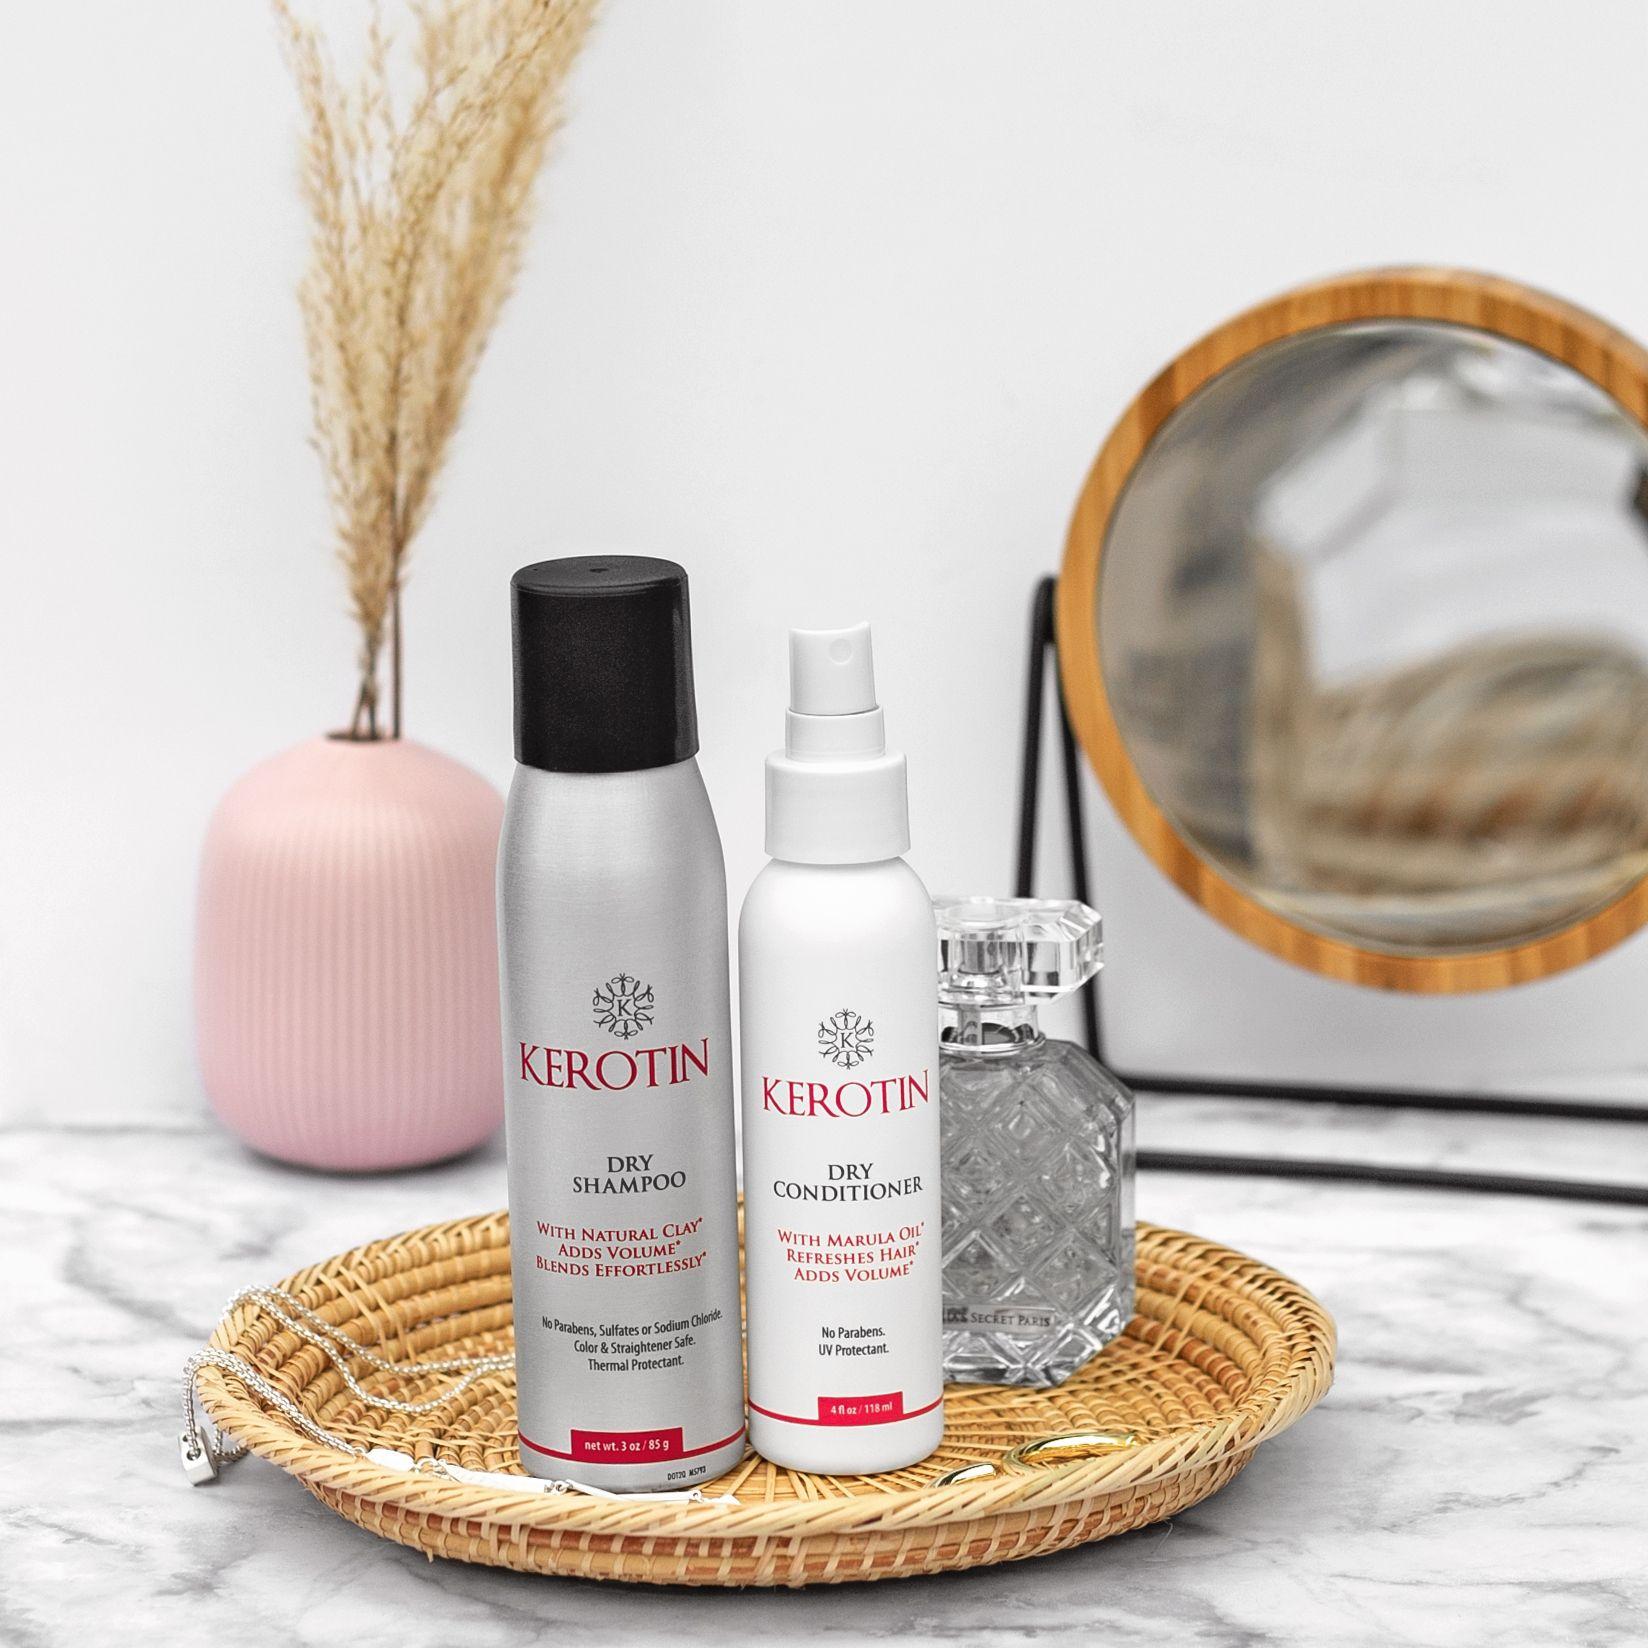 Dry Shampoo Dry Conditioner In 2020 Dry Shampoo Dry Conditioner Shampoo